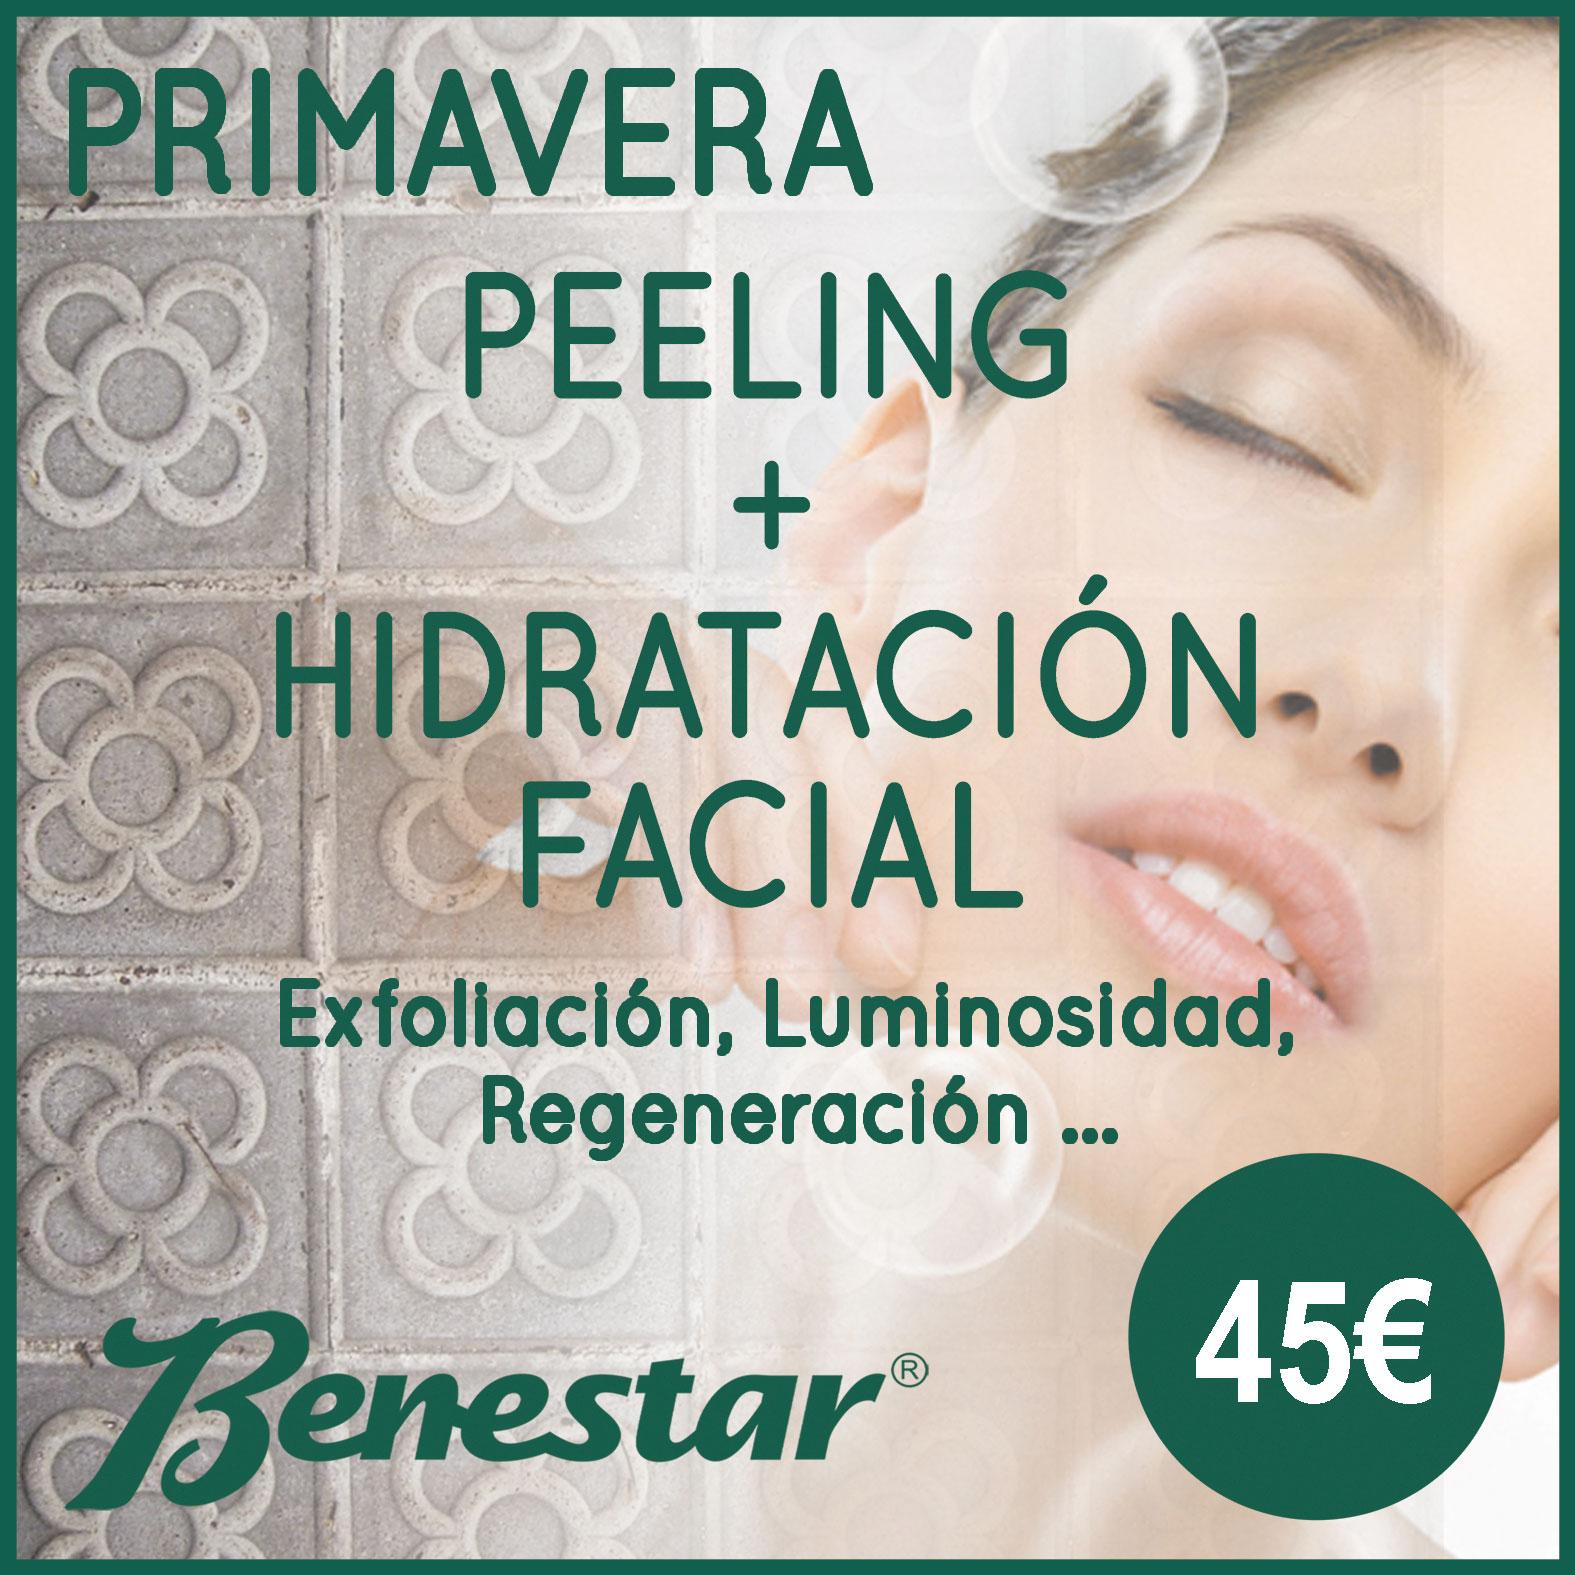 Peeling-hidratacion-facial-centro-estetica-barcelona